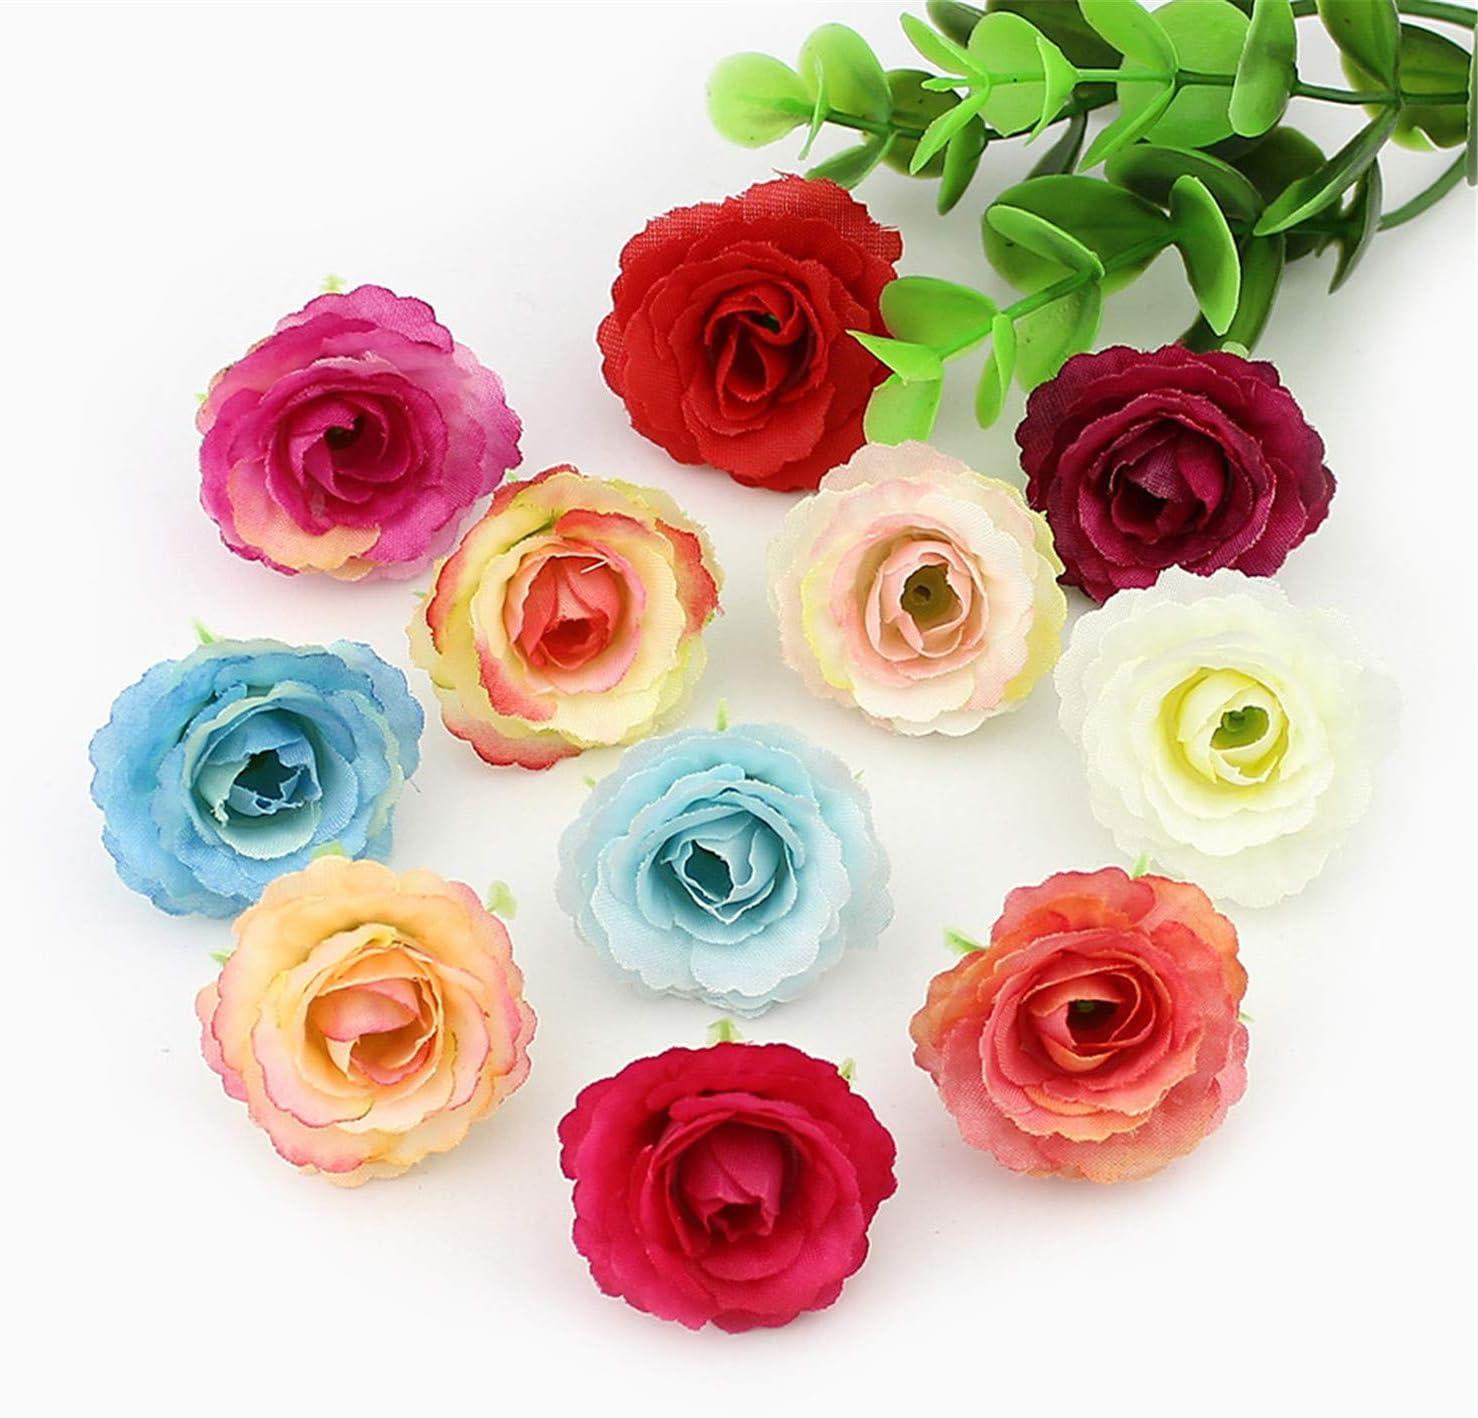 - Amazon.com: Evan Fordd 3cm Artificial Rose Flower Heads Silk